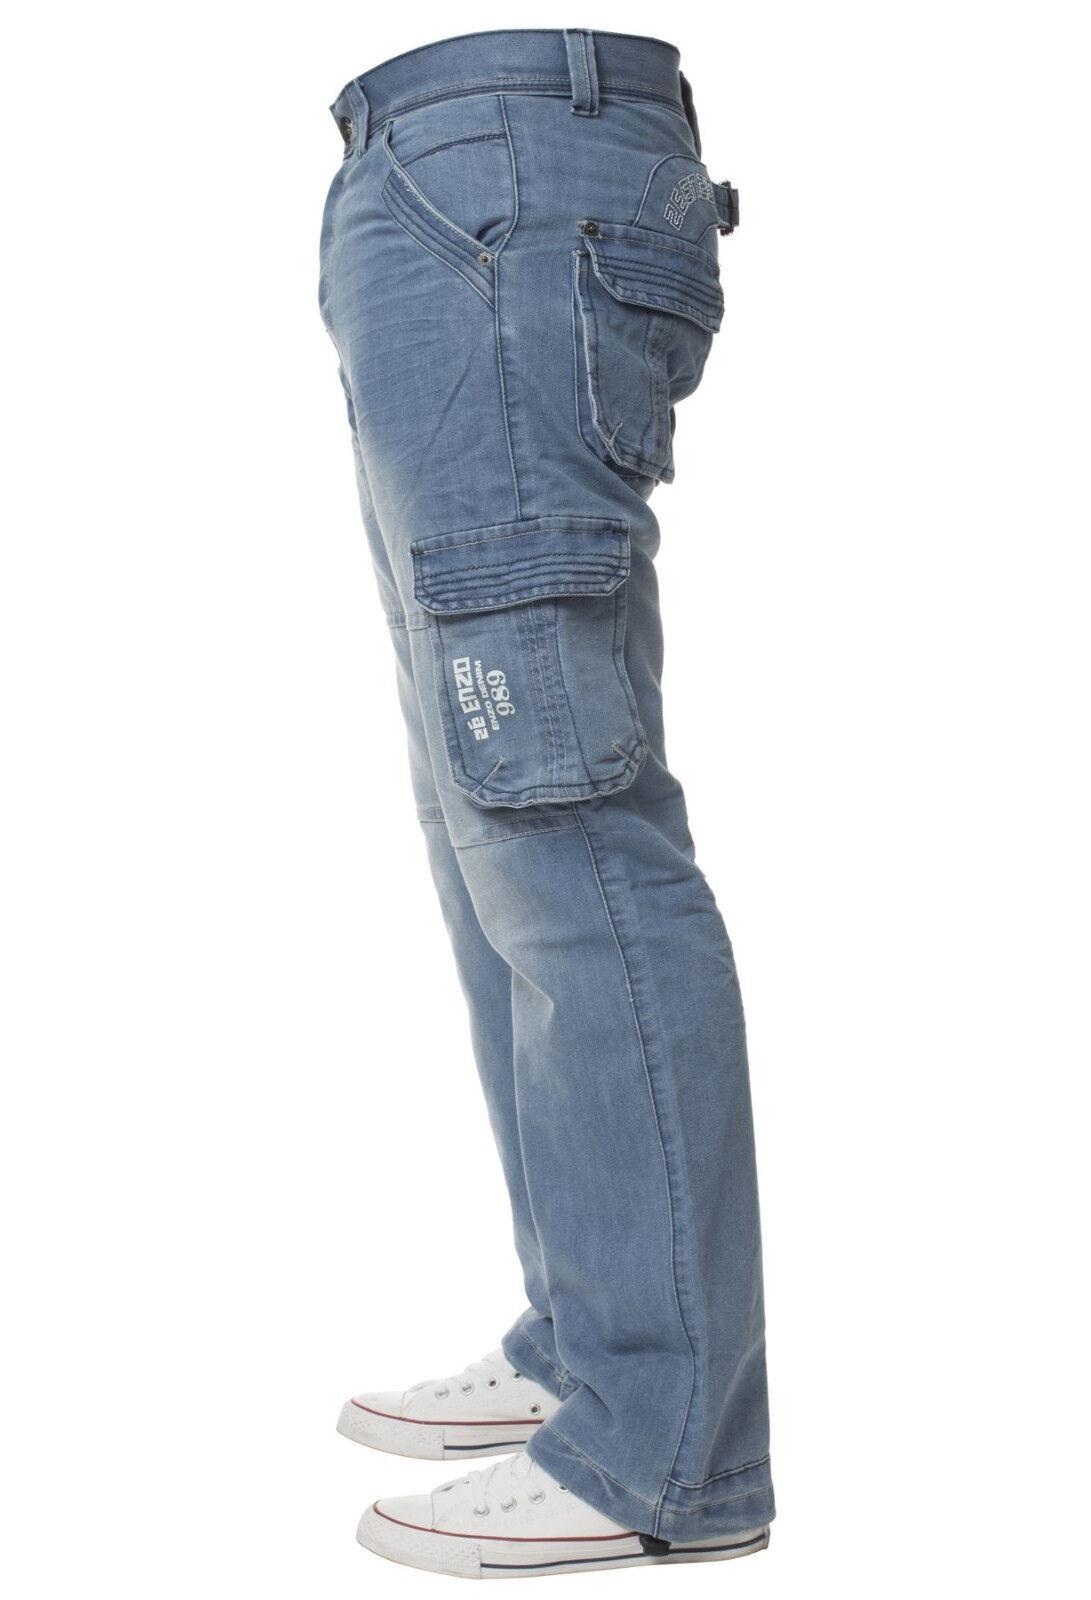 Mens Enzo EZ356 Branded Denim Jeans Regular Fit Western Trousers Pants